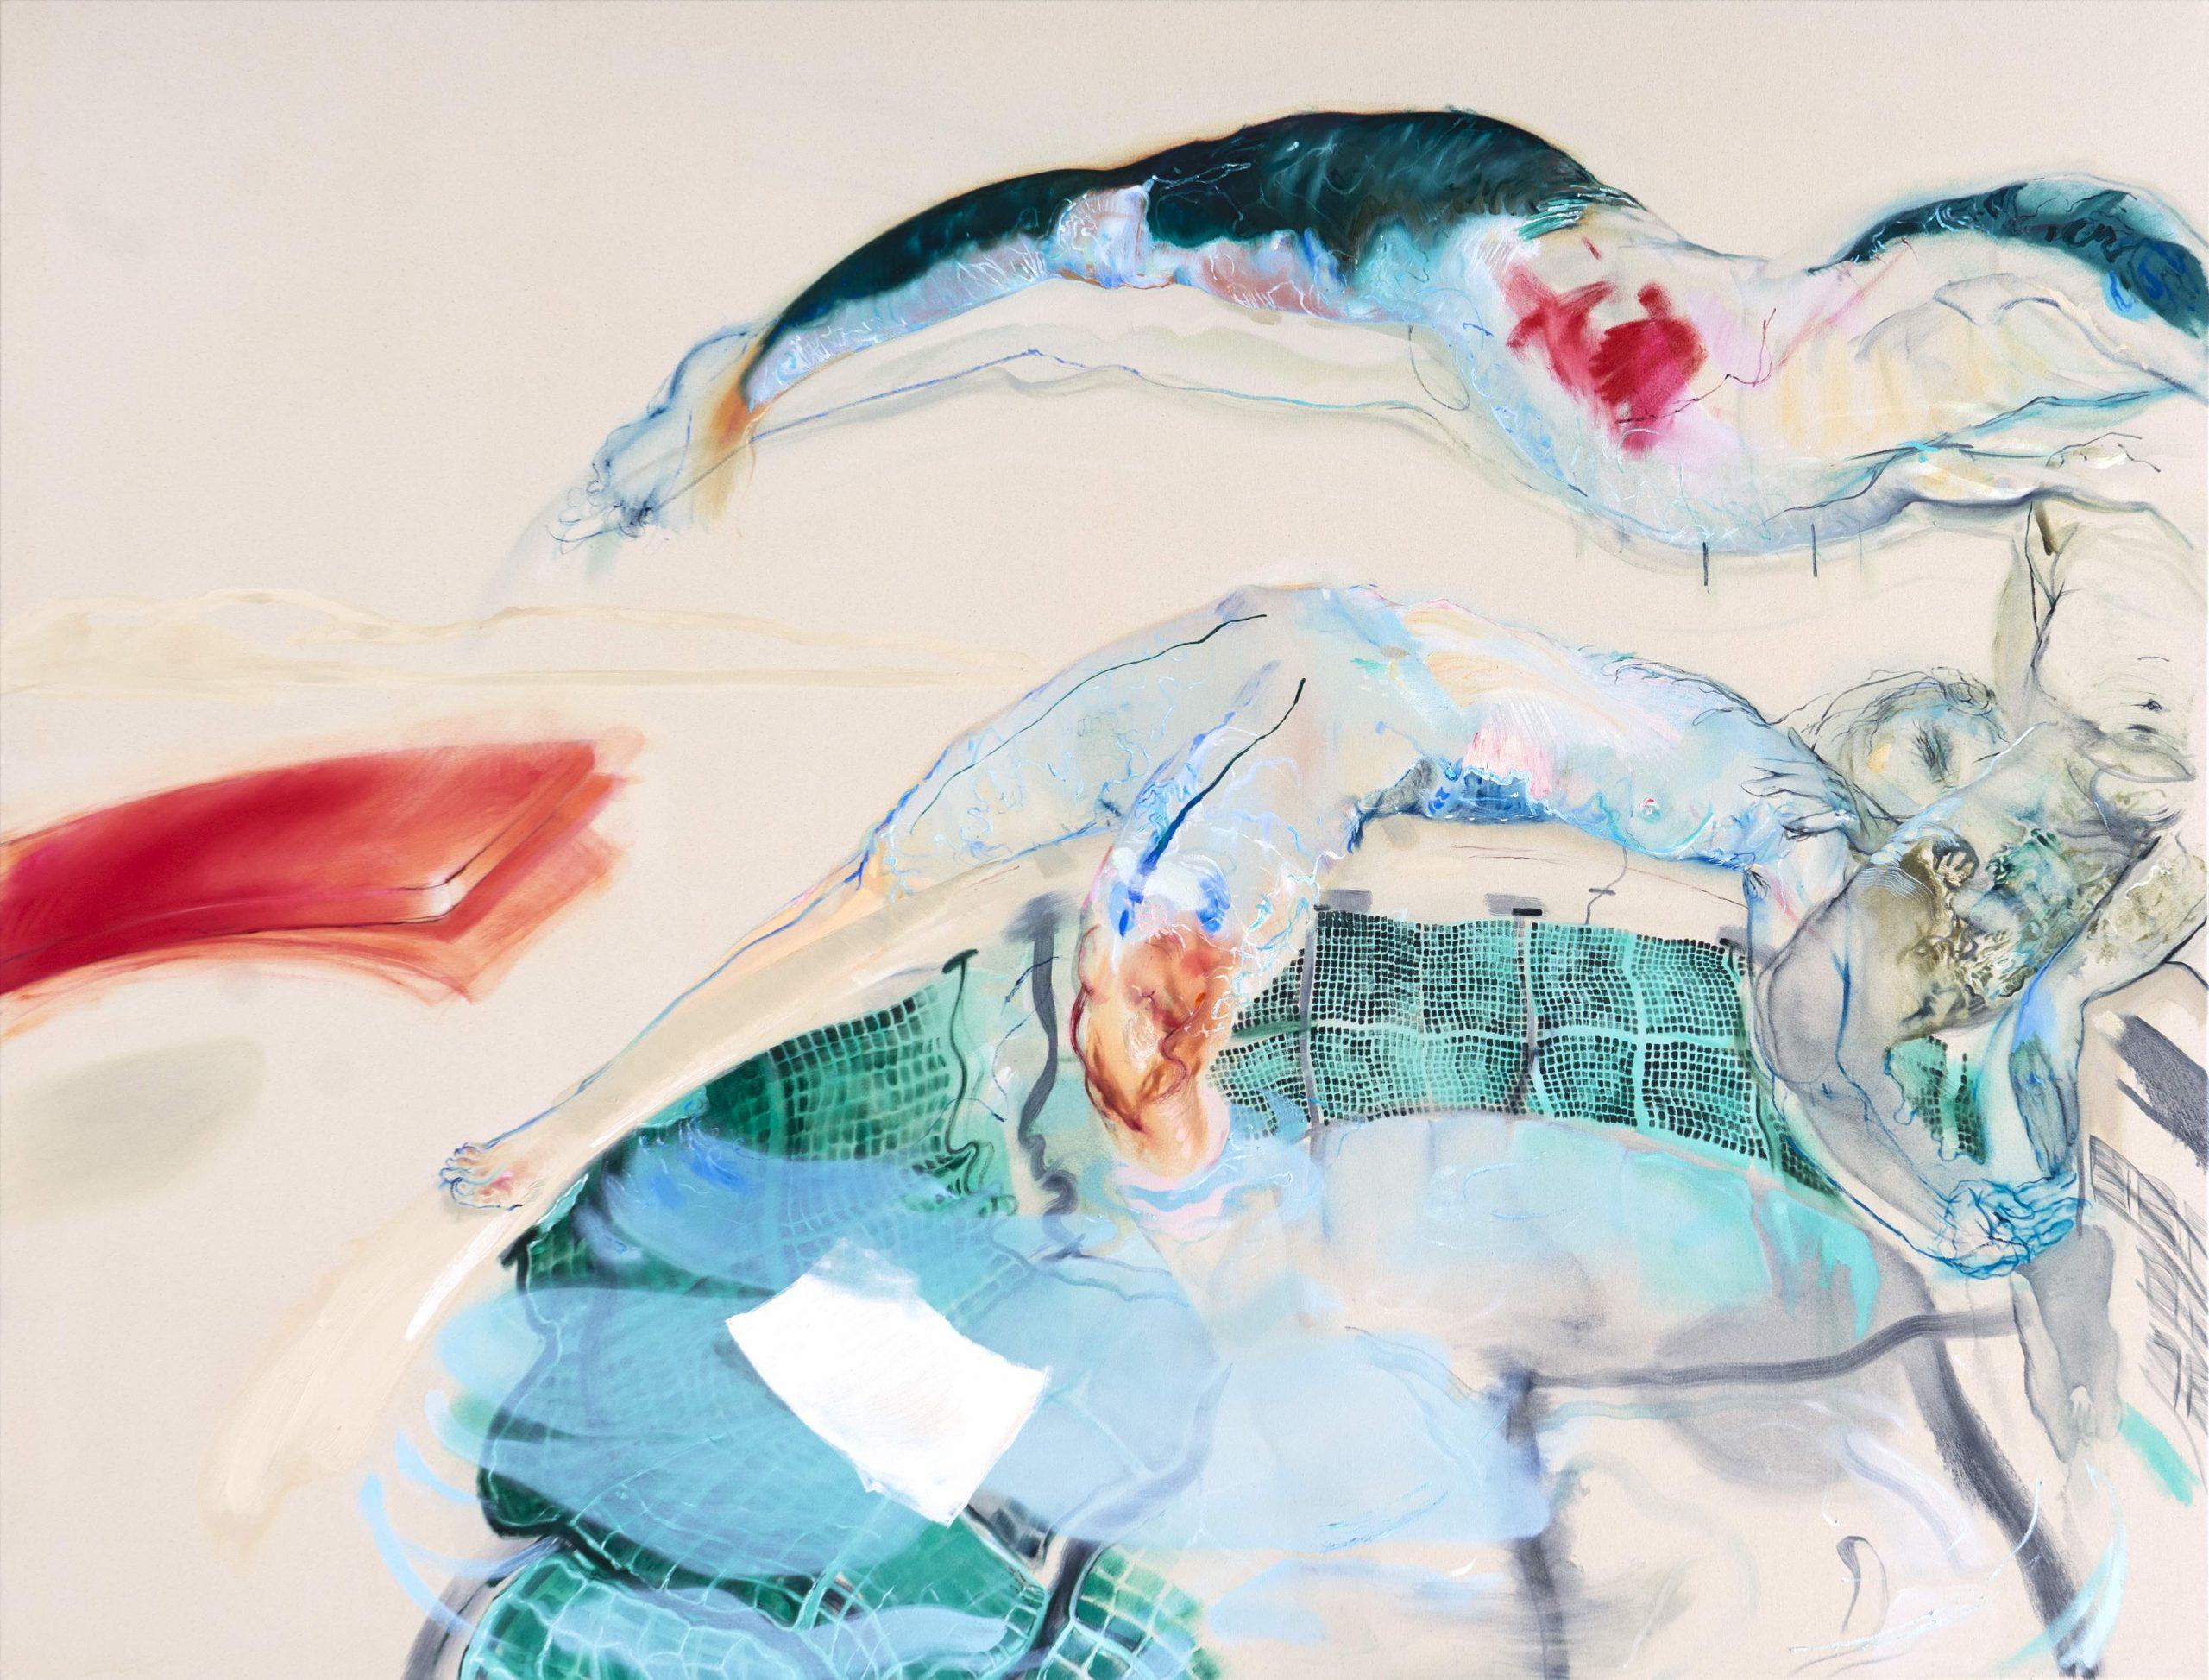 1mb Araminta Blue_Swimming Pool_150 x 200 cm_ oil on canvas_2020